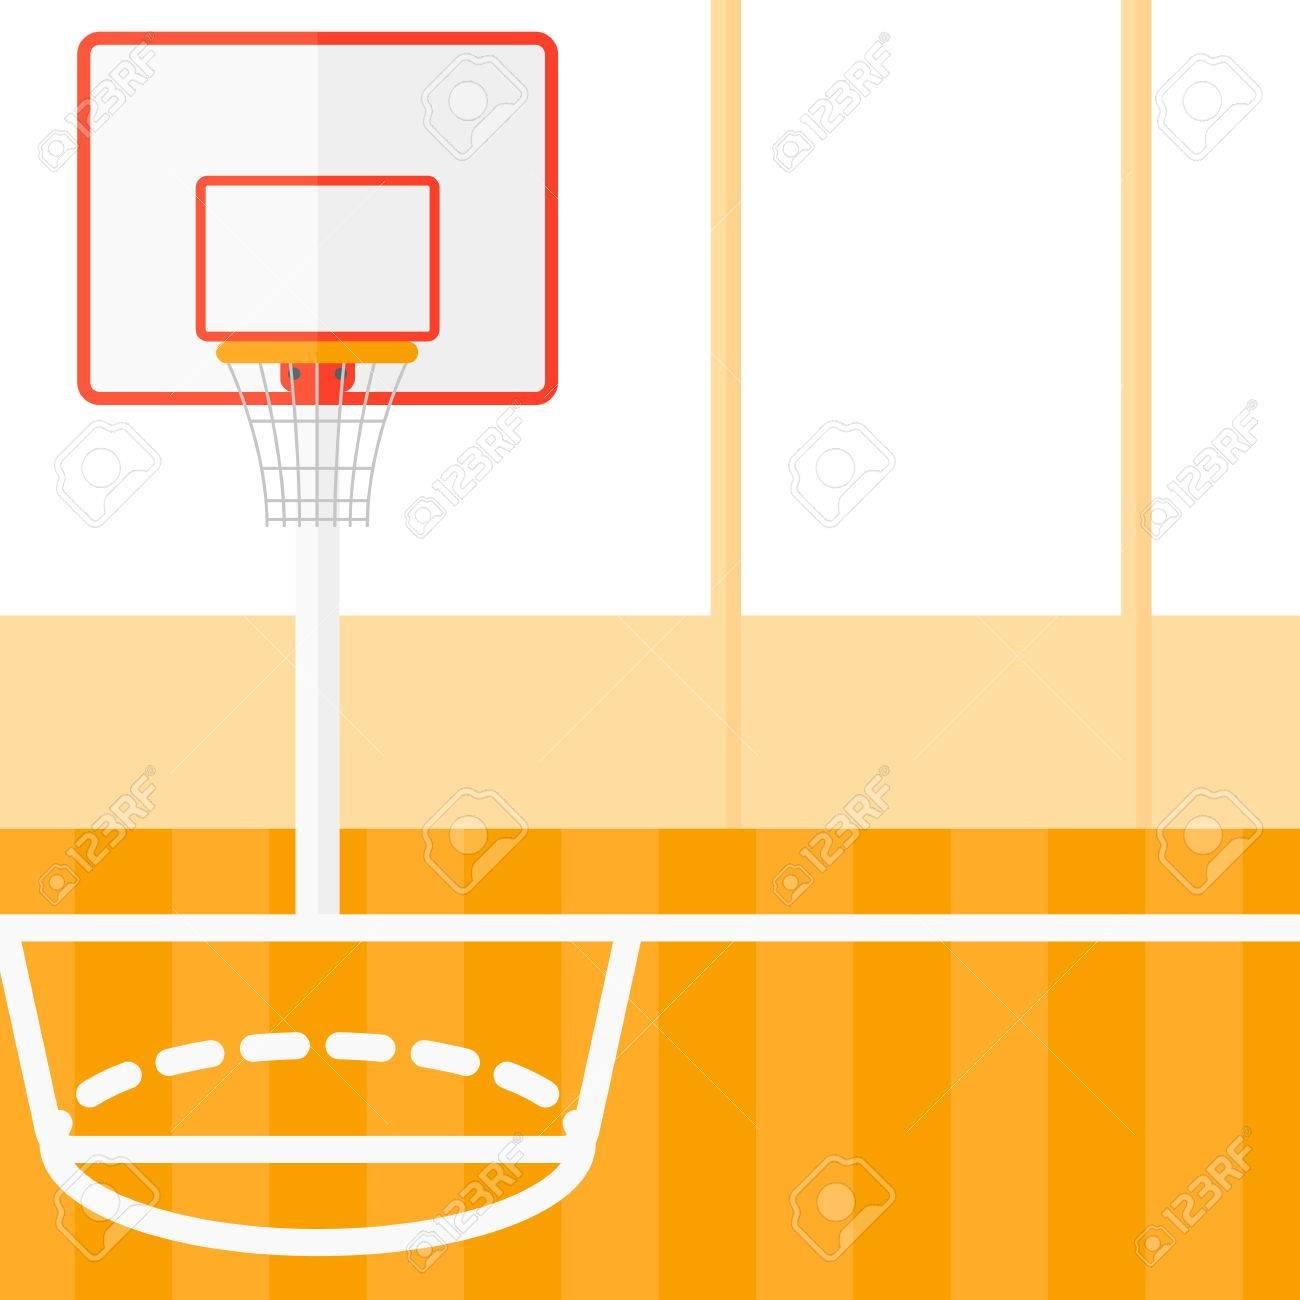 background of basketball court vector flat design illustration rh 123rf com basketball court vector free basketball court vector logo